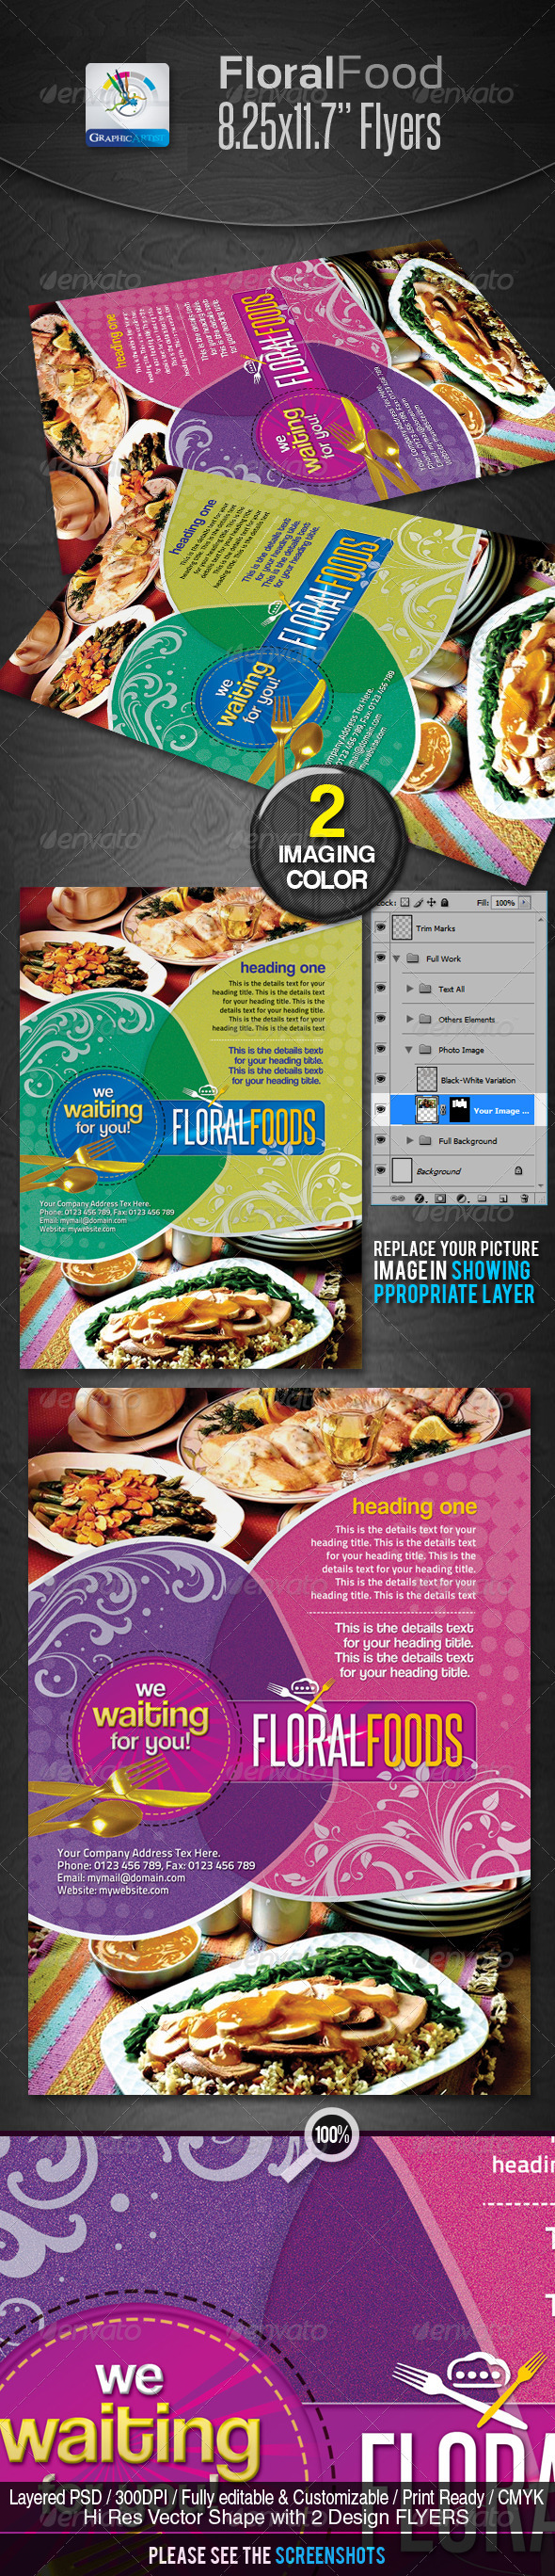 Floral Restaurant Food Flyers - Restaurant Flyers